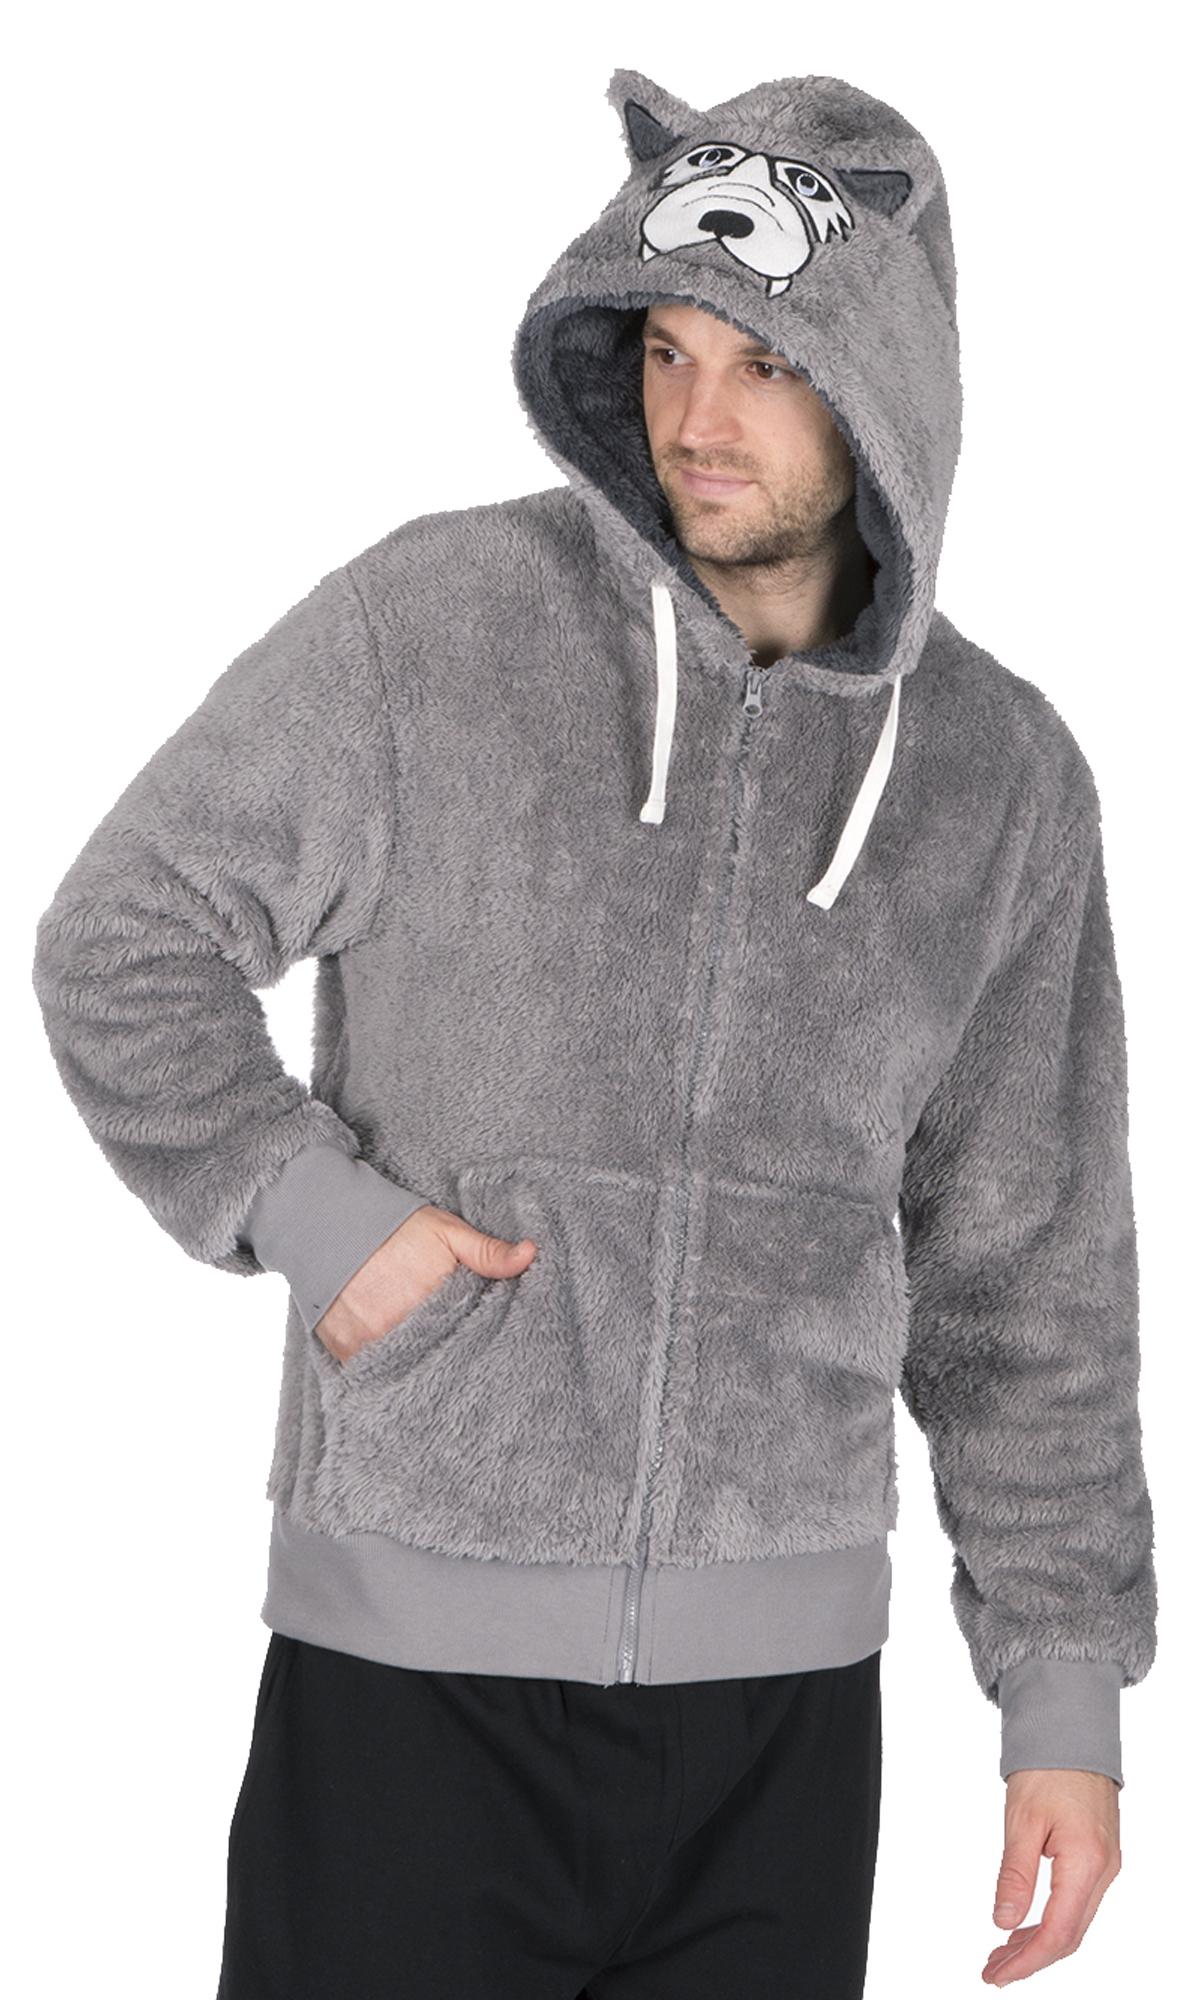 Mens Hooded Fleece Snuggle Top Bed Jacket Fun Novelty